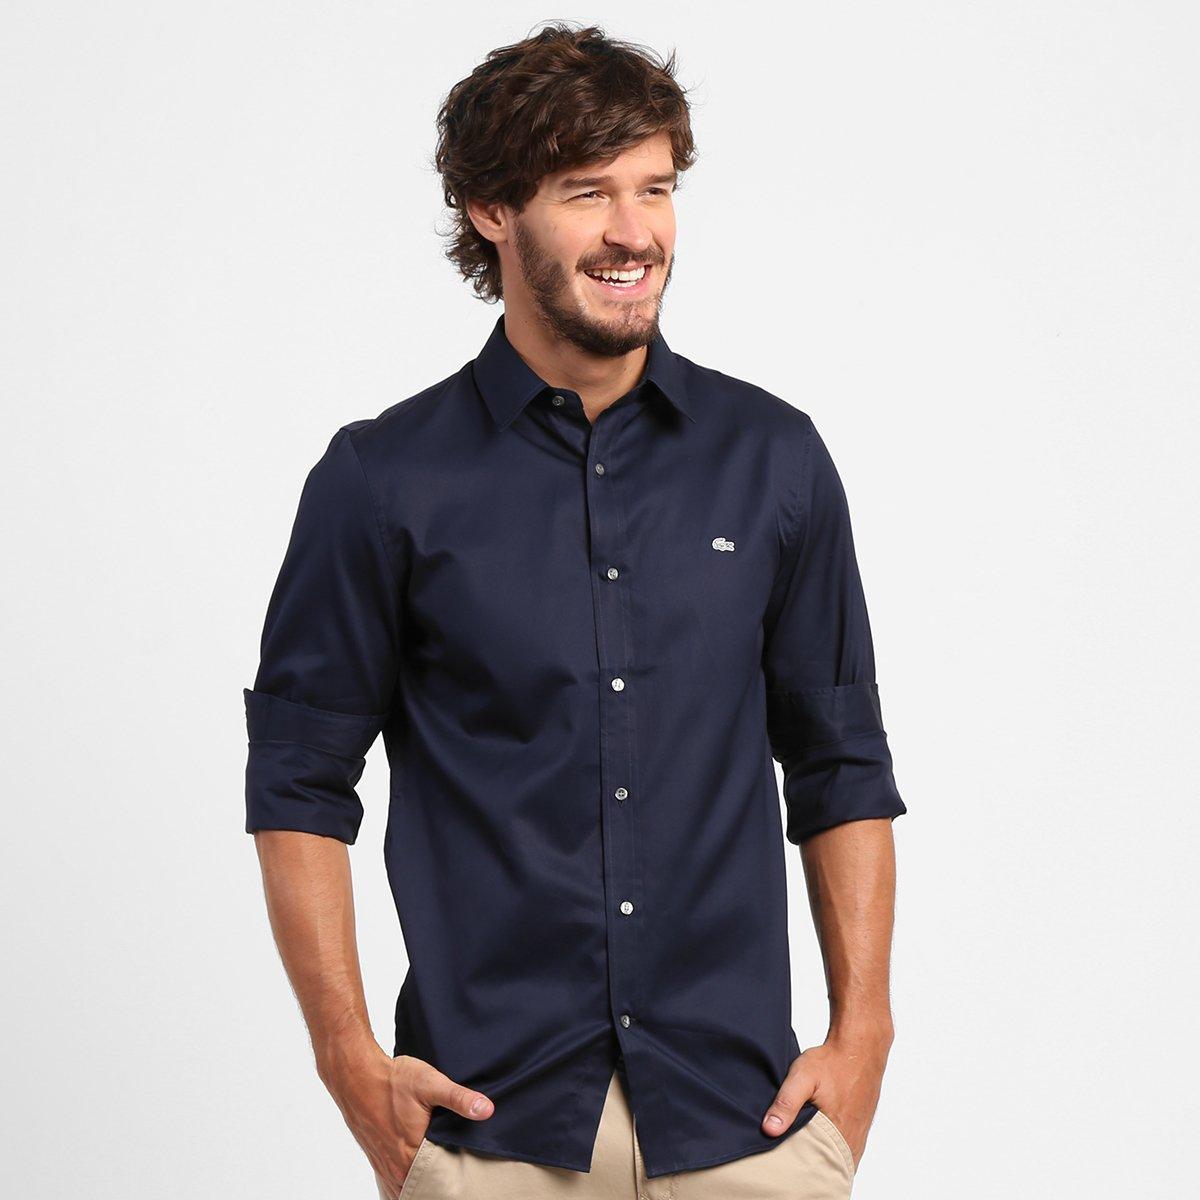 d18dcda005d05 Camisa Lacoste Slim Fit - Compre Agora   Zattini